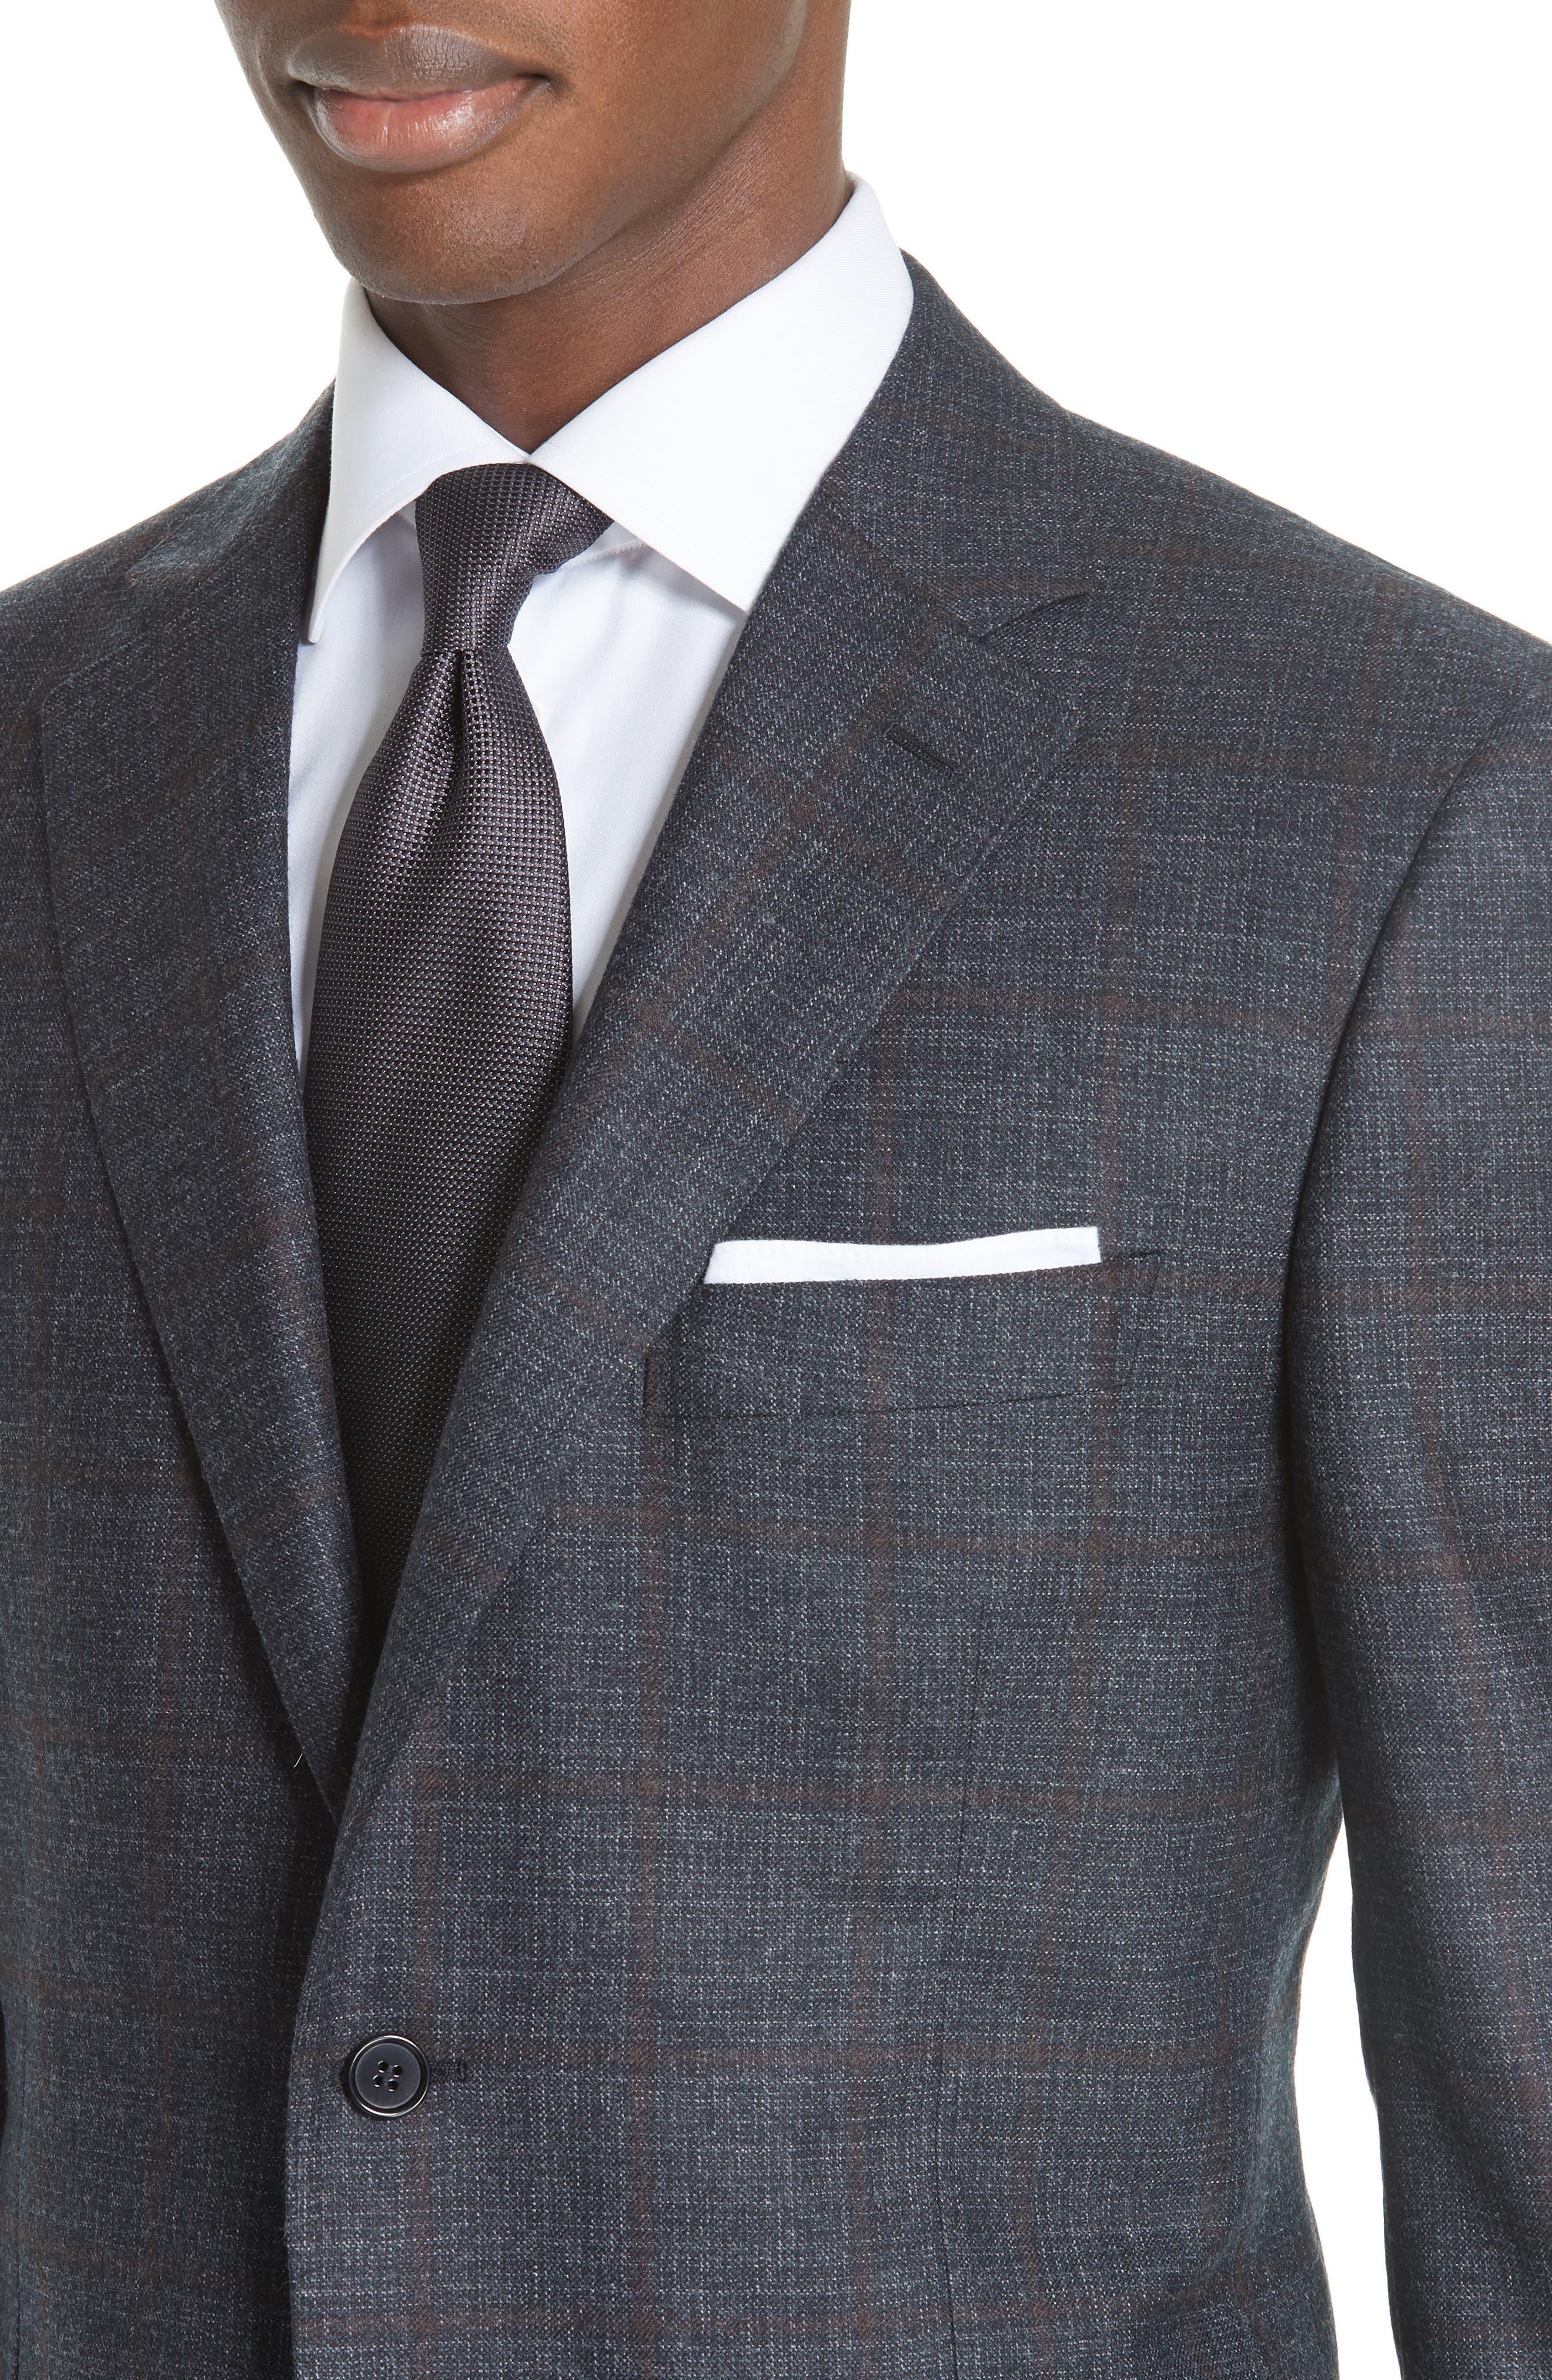 Classic Fit Plaid Wool Sport Coat,                             Alternate thumbnail 4, color,                             CHARCOAL